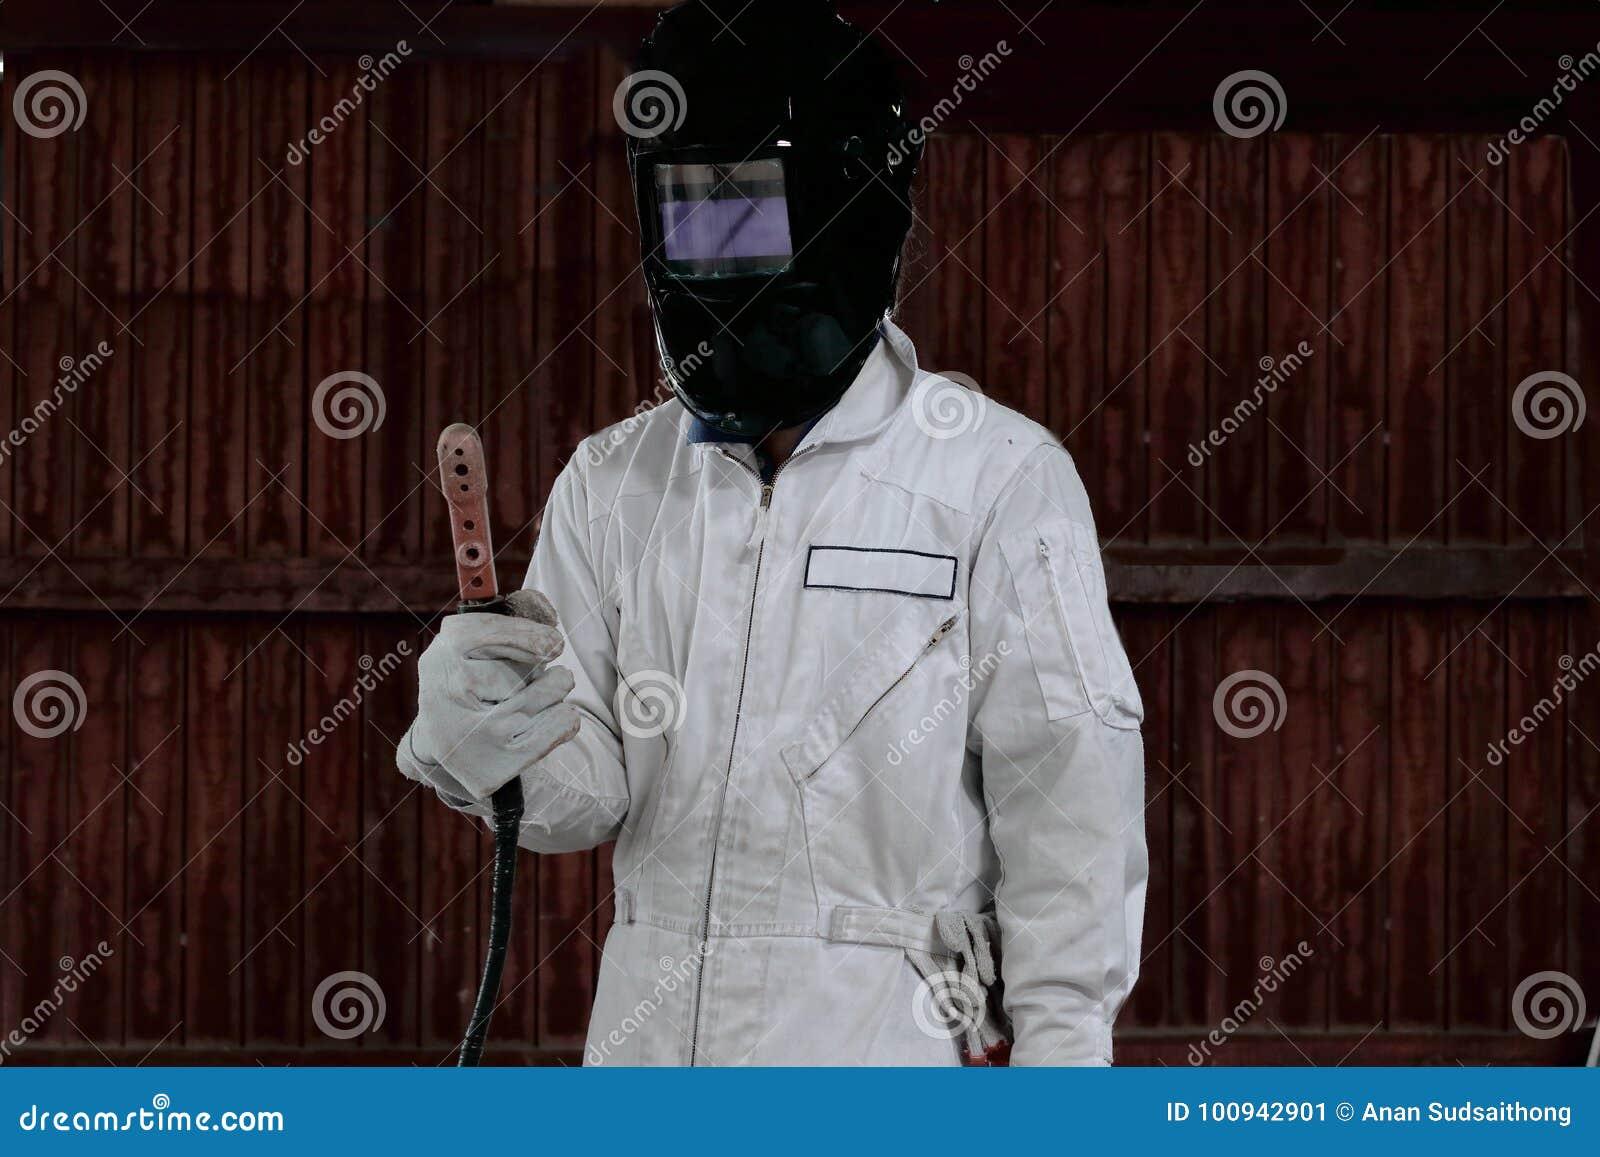 Portrait of craftsman welder in white uniform holding arc welding torch in hands. Industrial worker concept.